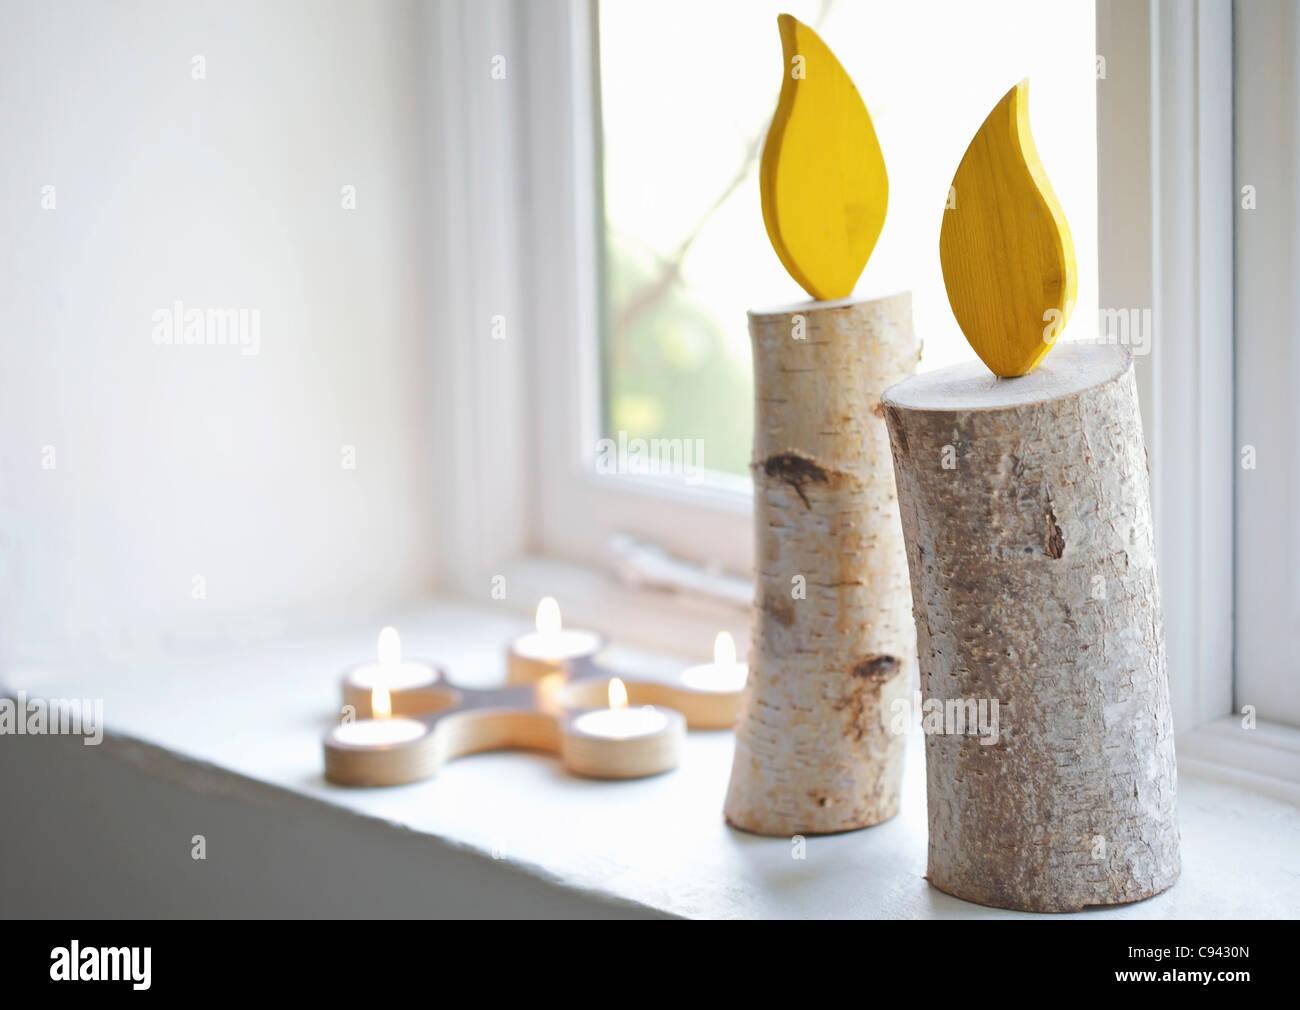 Handmade Decorative Candles on Window Sill Stock Photo Royalty